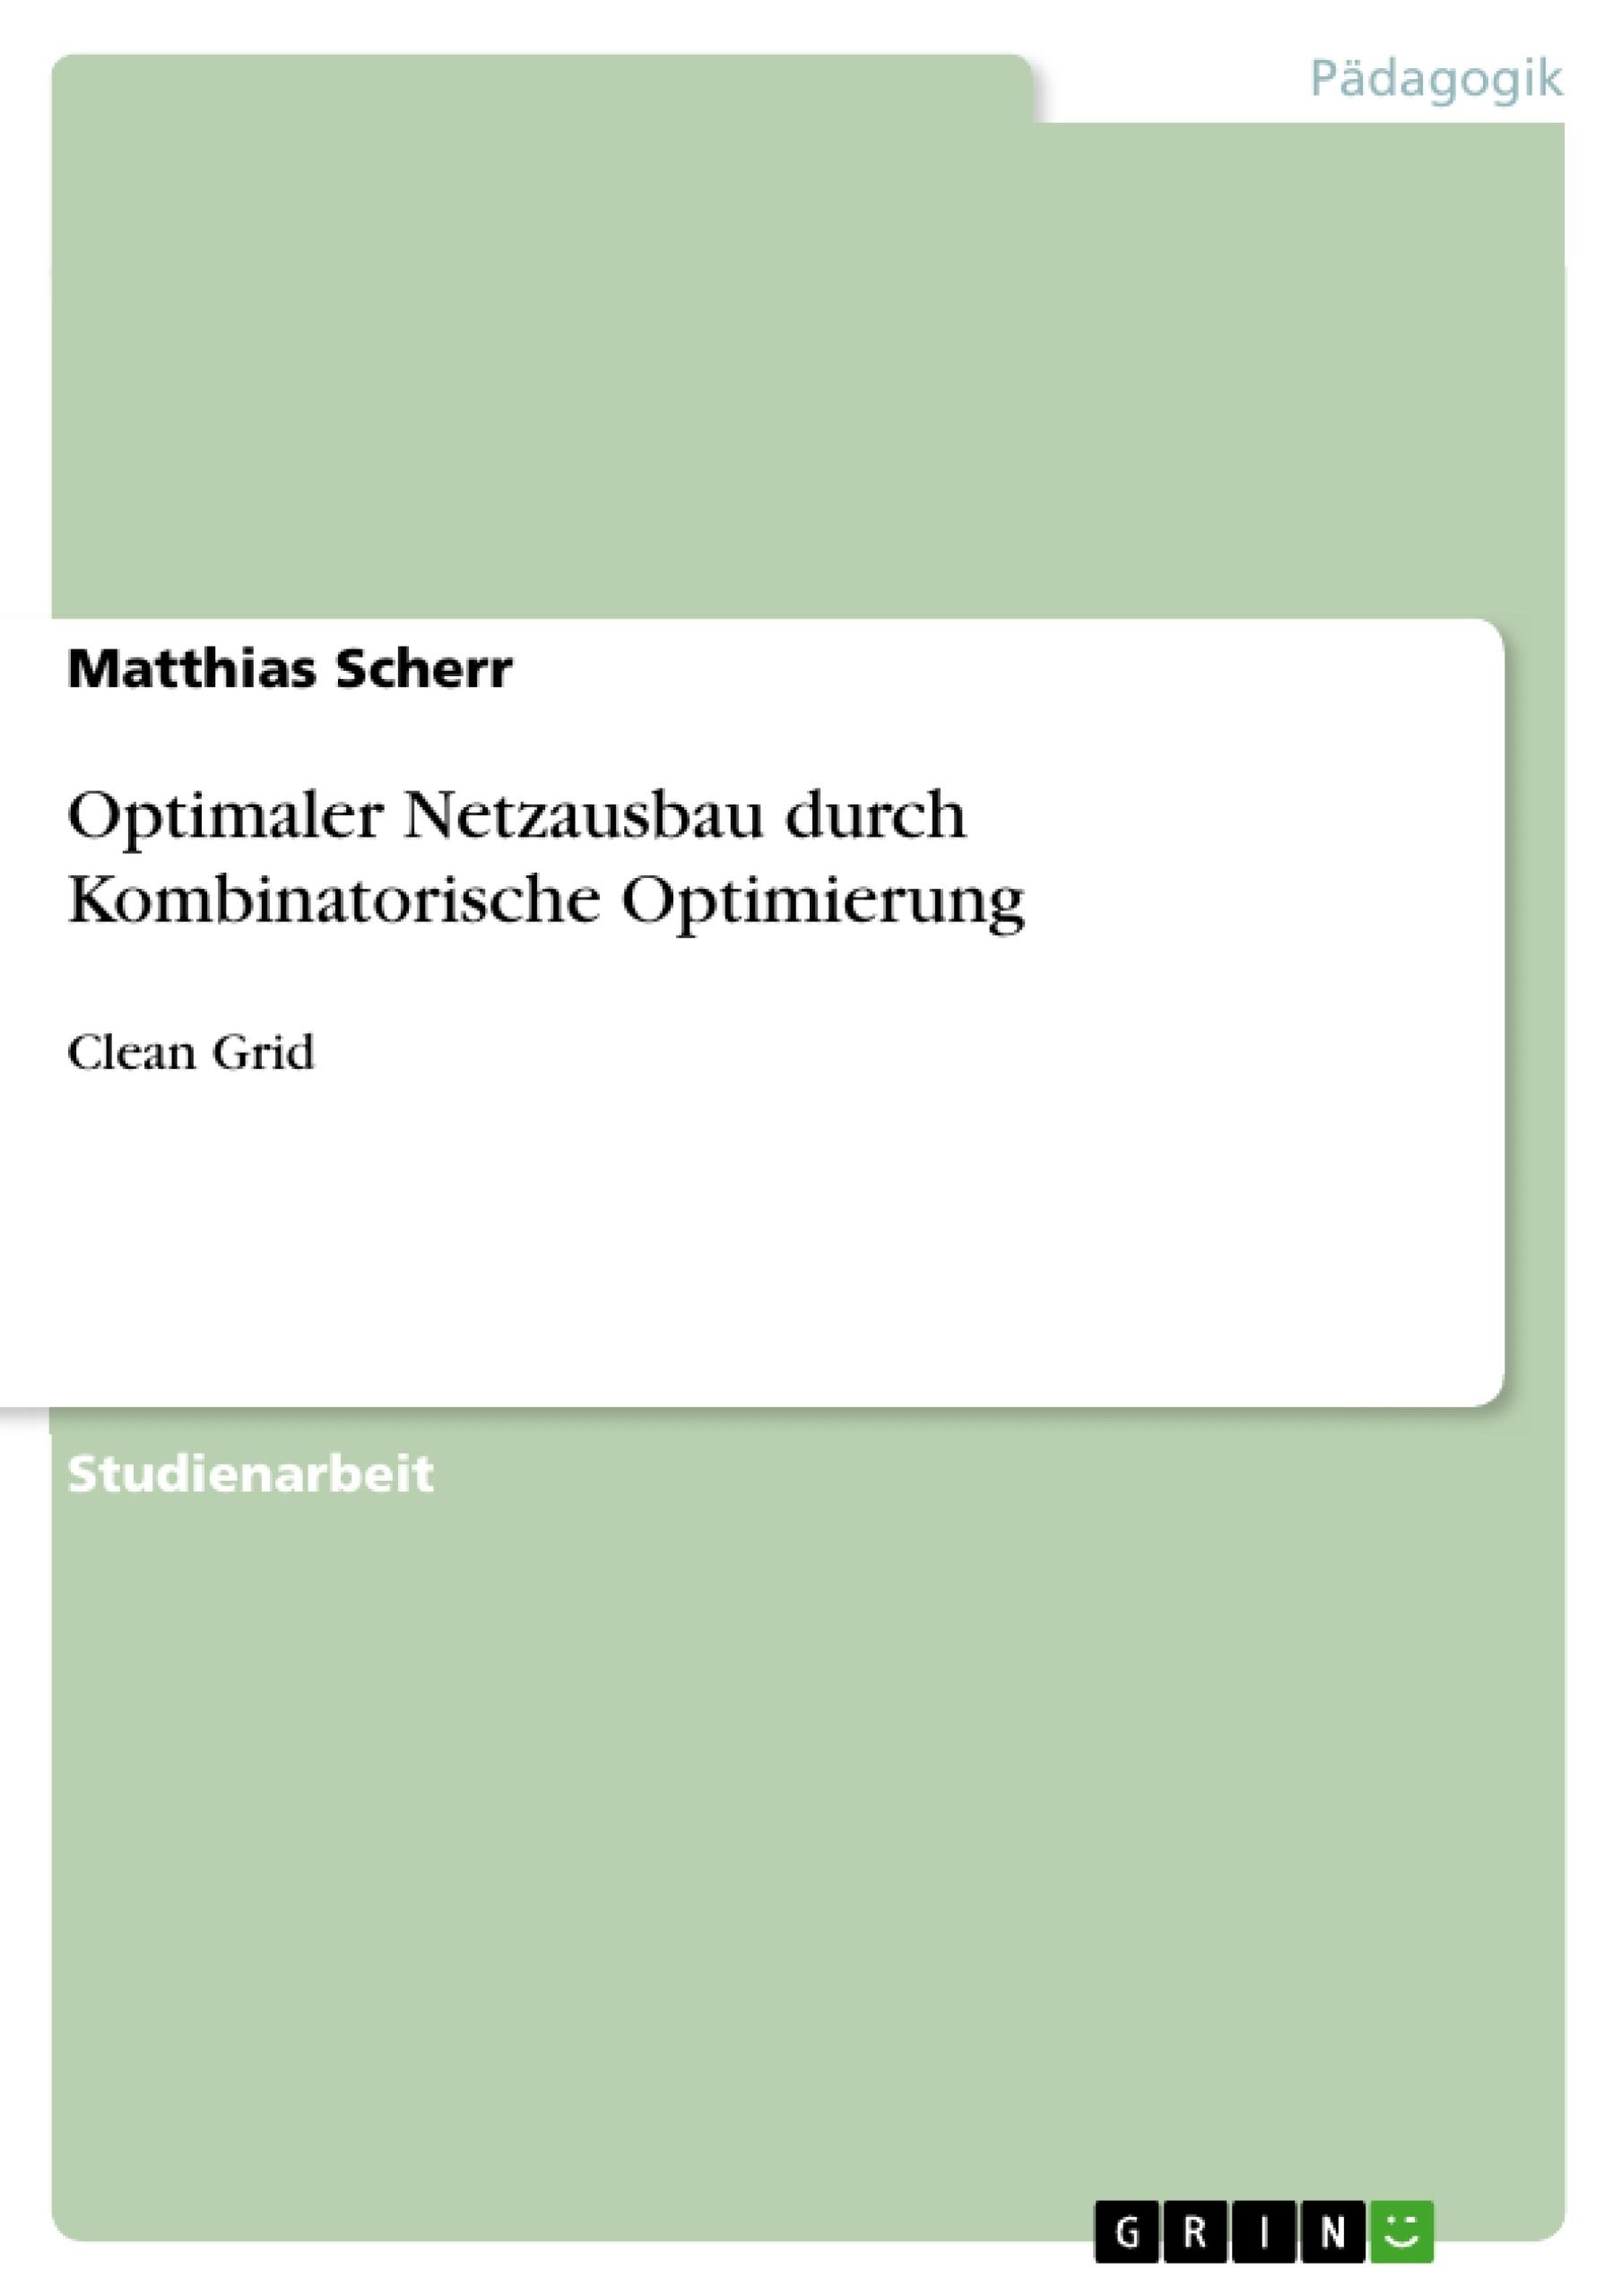 Titel: Optimaler Netzausbau durch Kombinatorische Optimierung